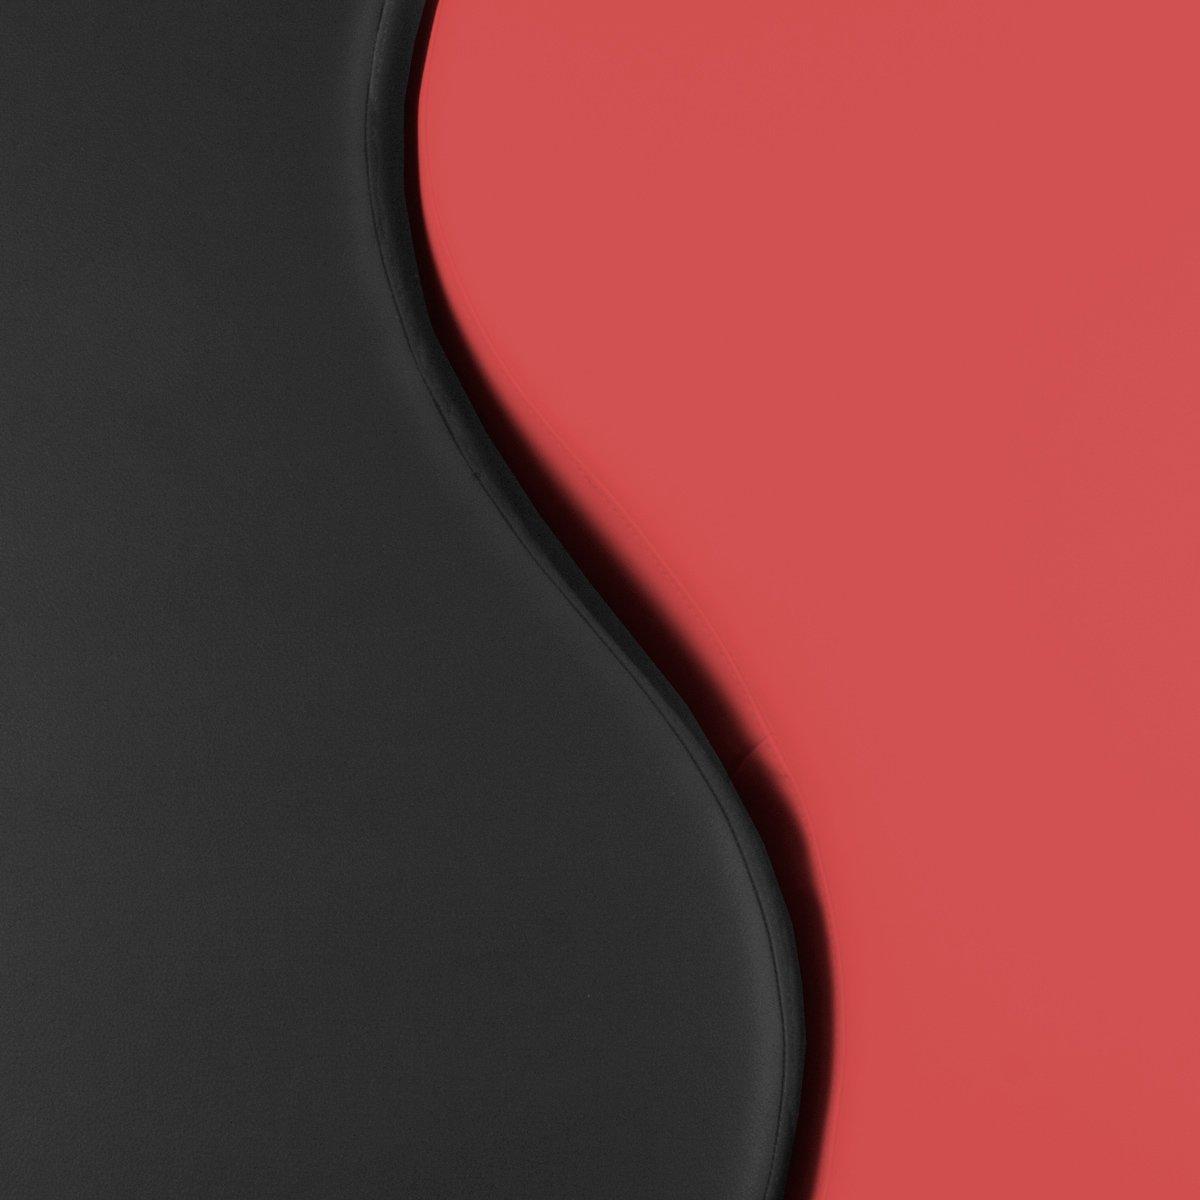 Arketicom Puff Puff Yin & Yang Blanco y Negro de poliuretano ...